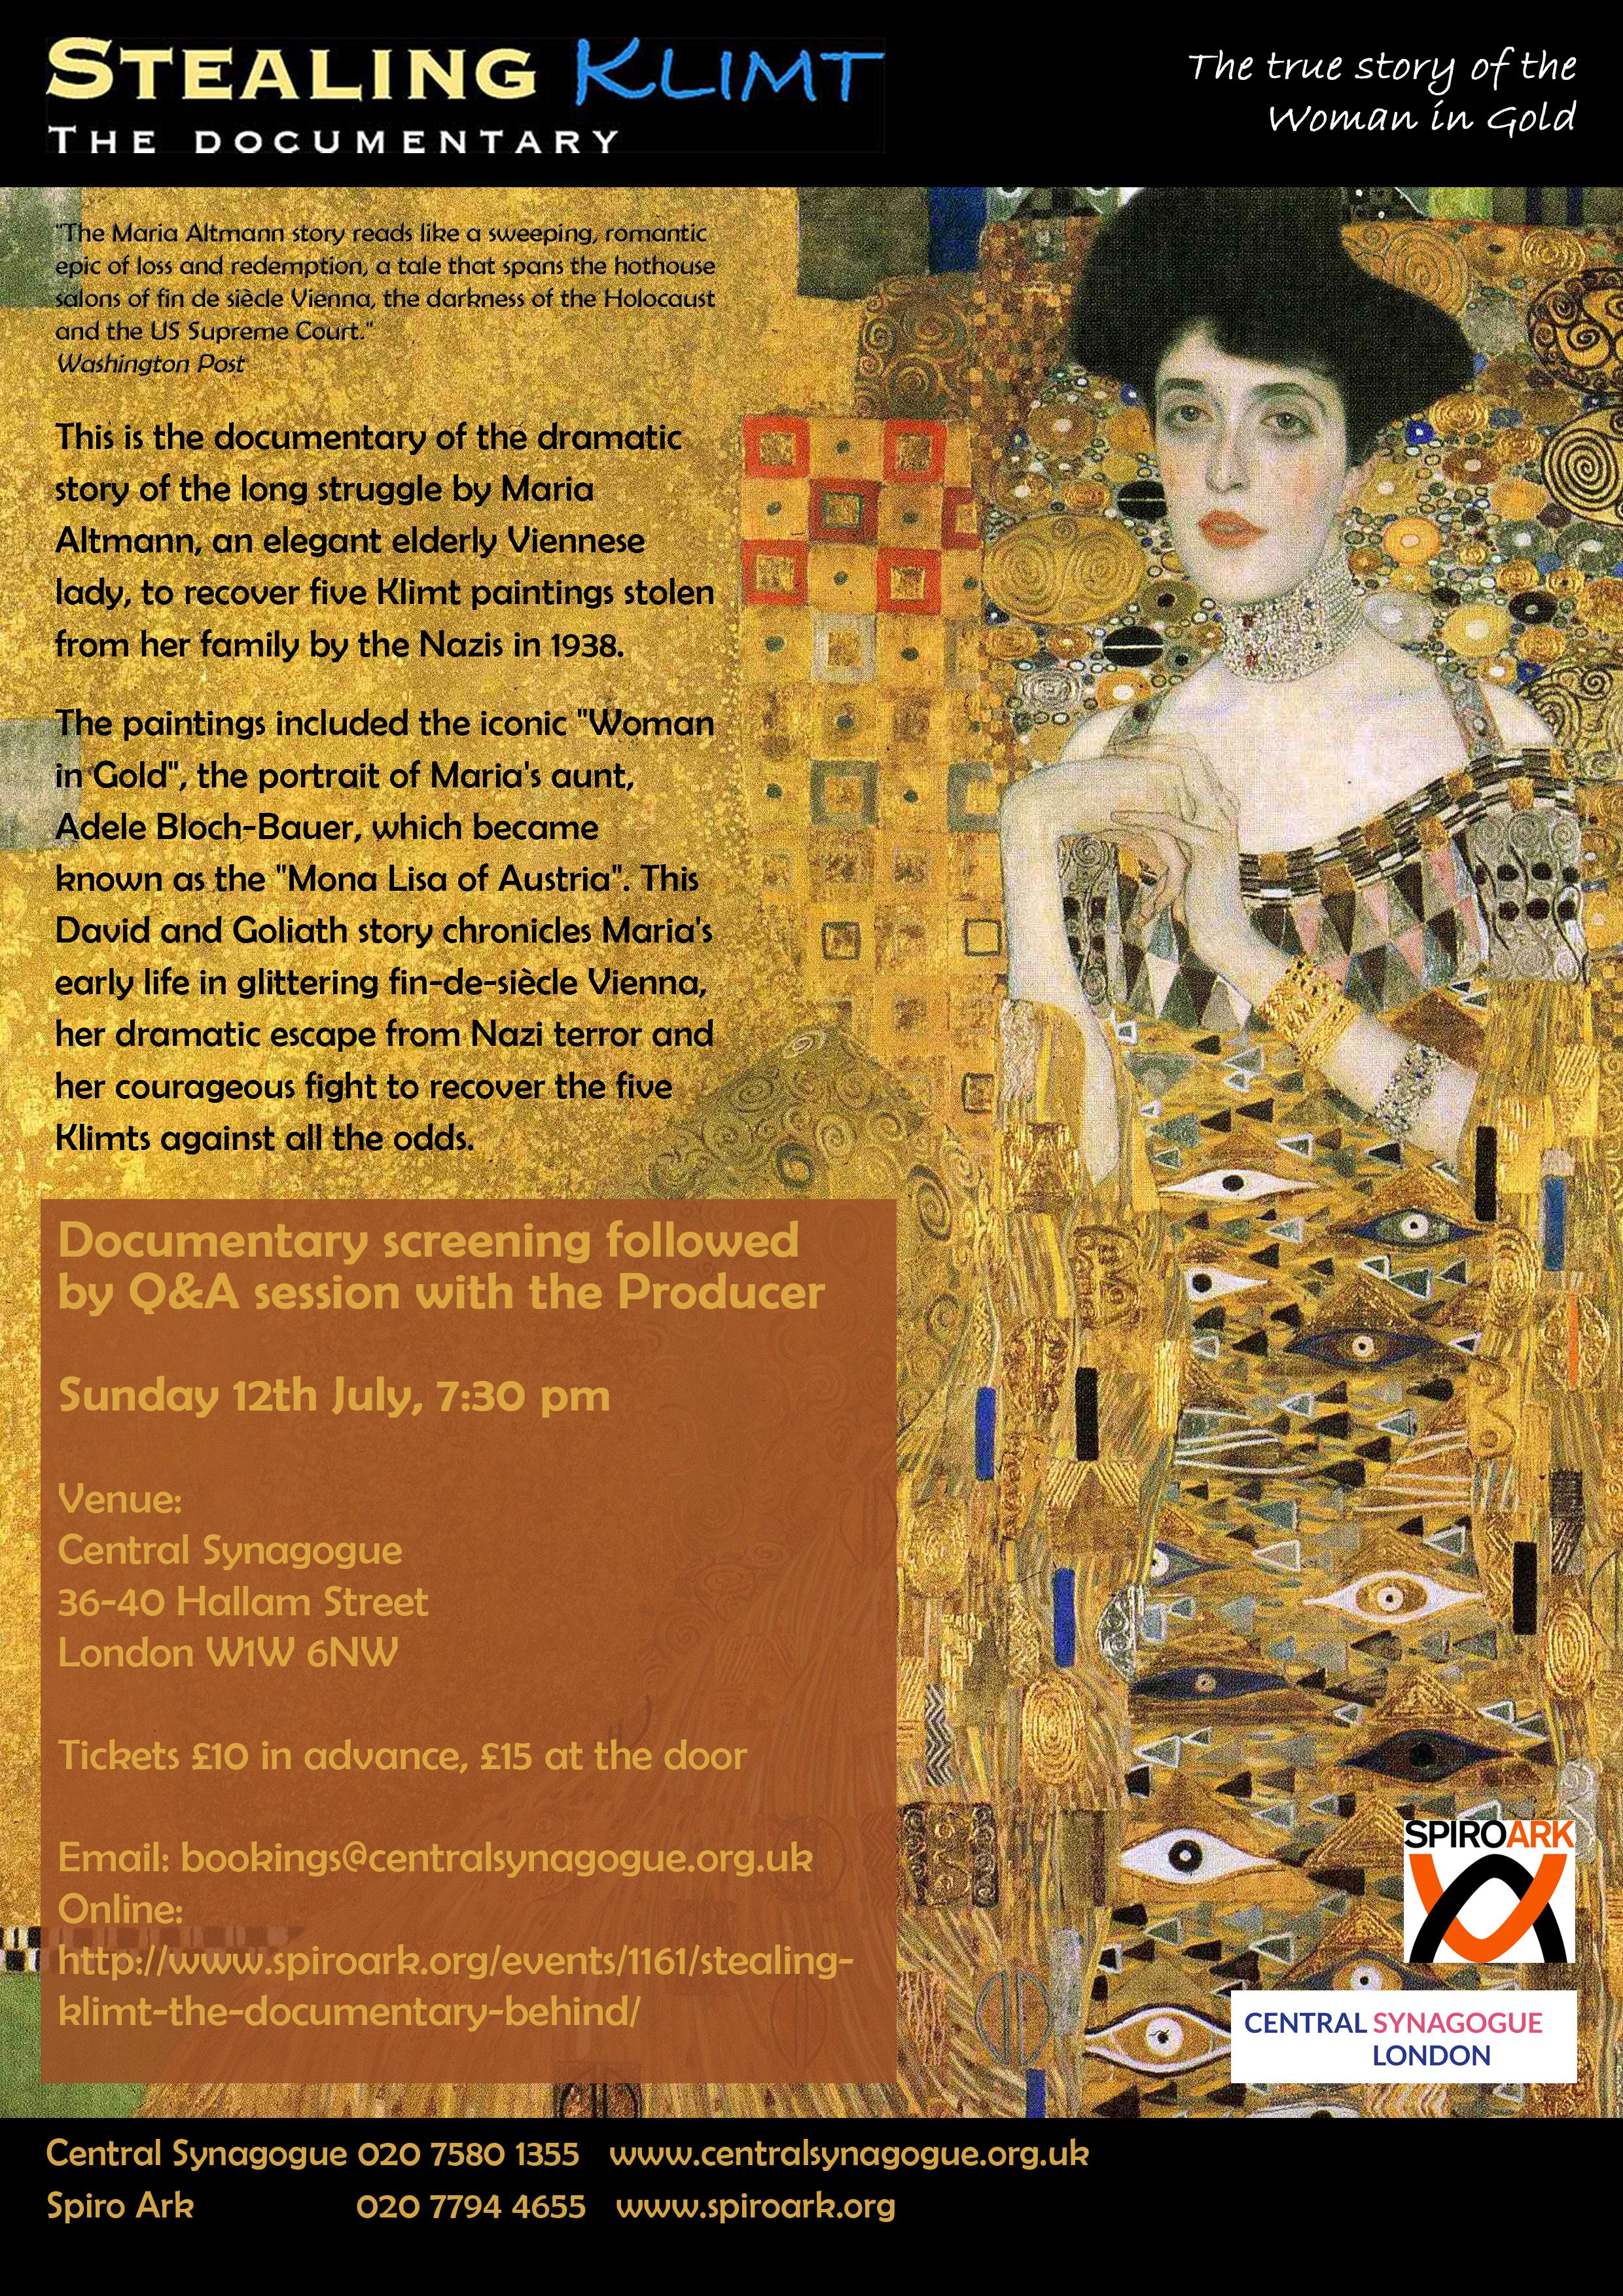 Stealing Klimt documentary evening copy